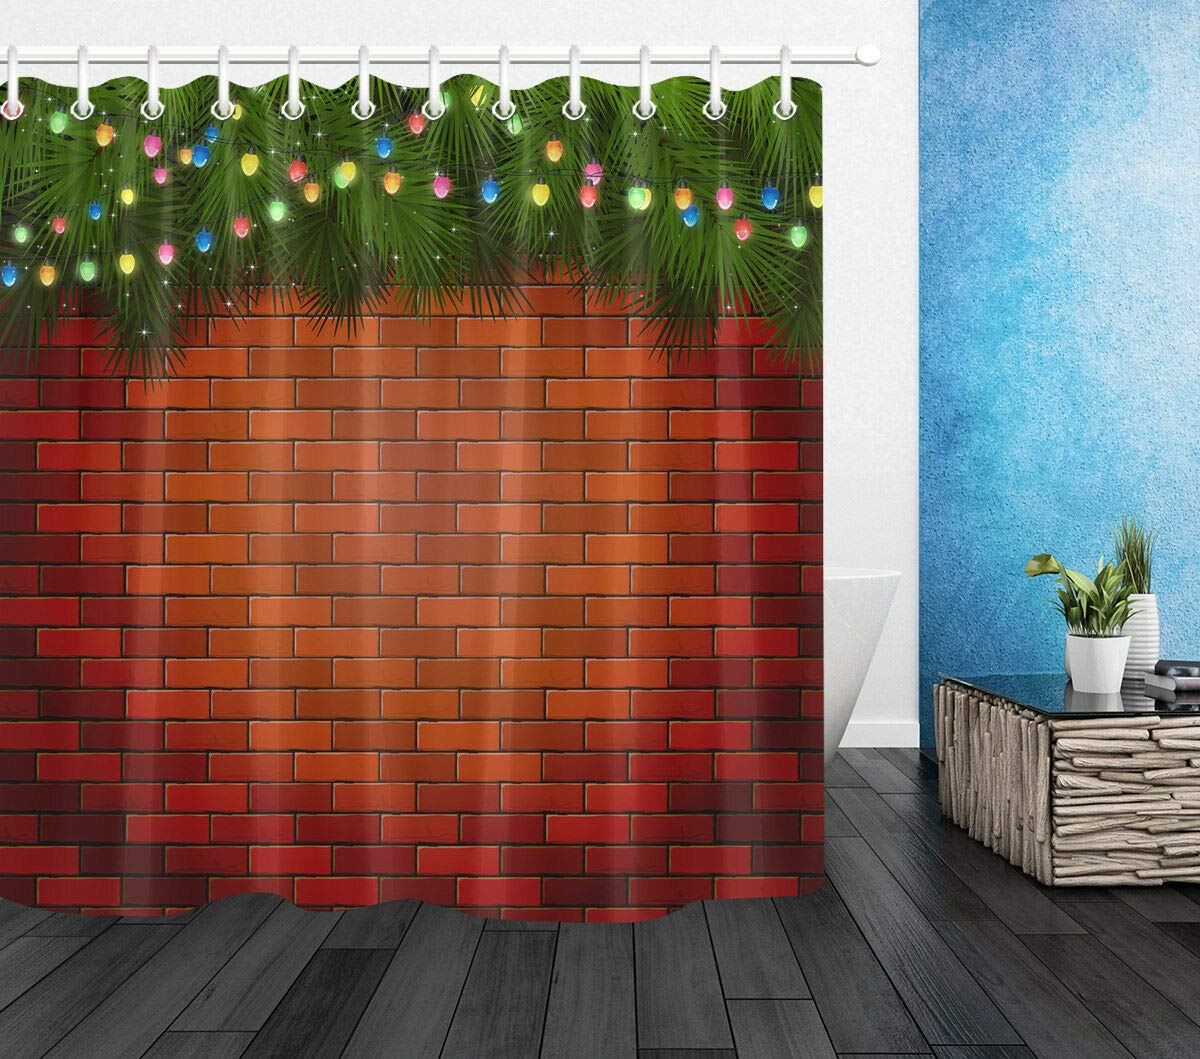 Tissu de Polyester Rideau de Douche et Crochets taquxinlaowan Sapin de No/ël Mur de Briques